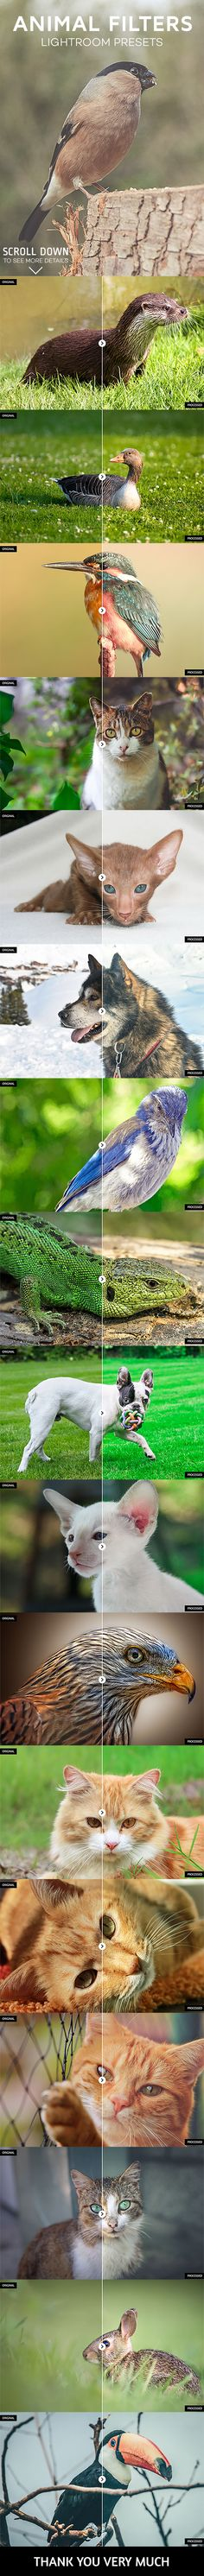 17 Animal Photography Lightroom Presets